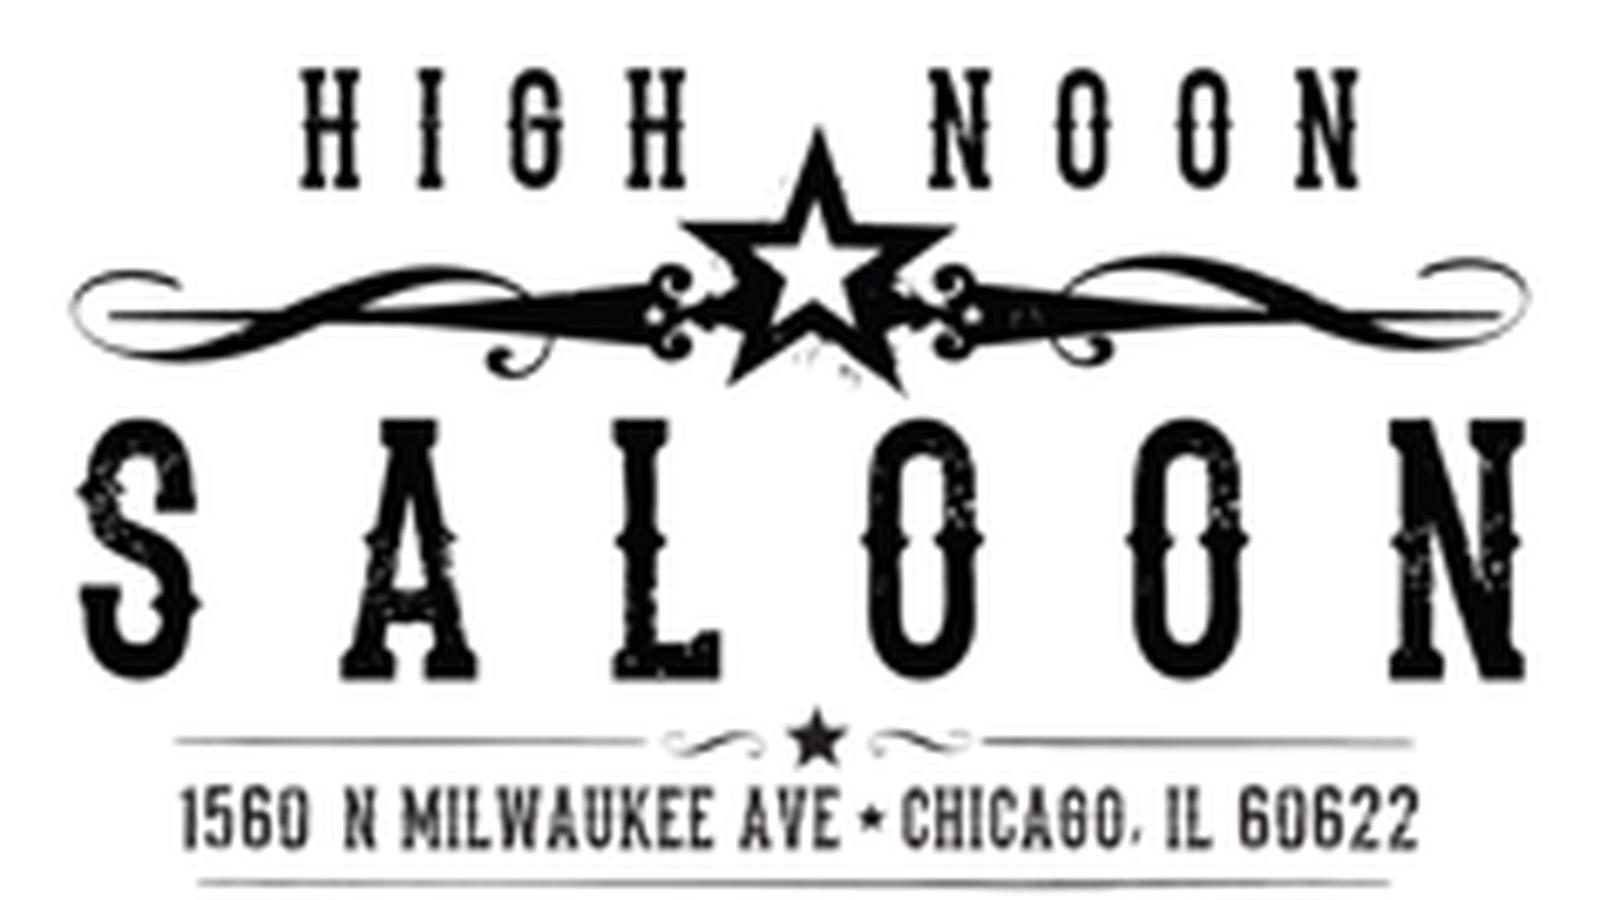 High Noon Saloon Replacing People Lounge in Two Weeks